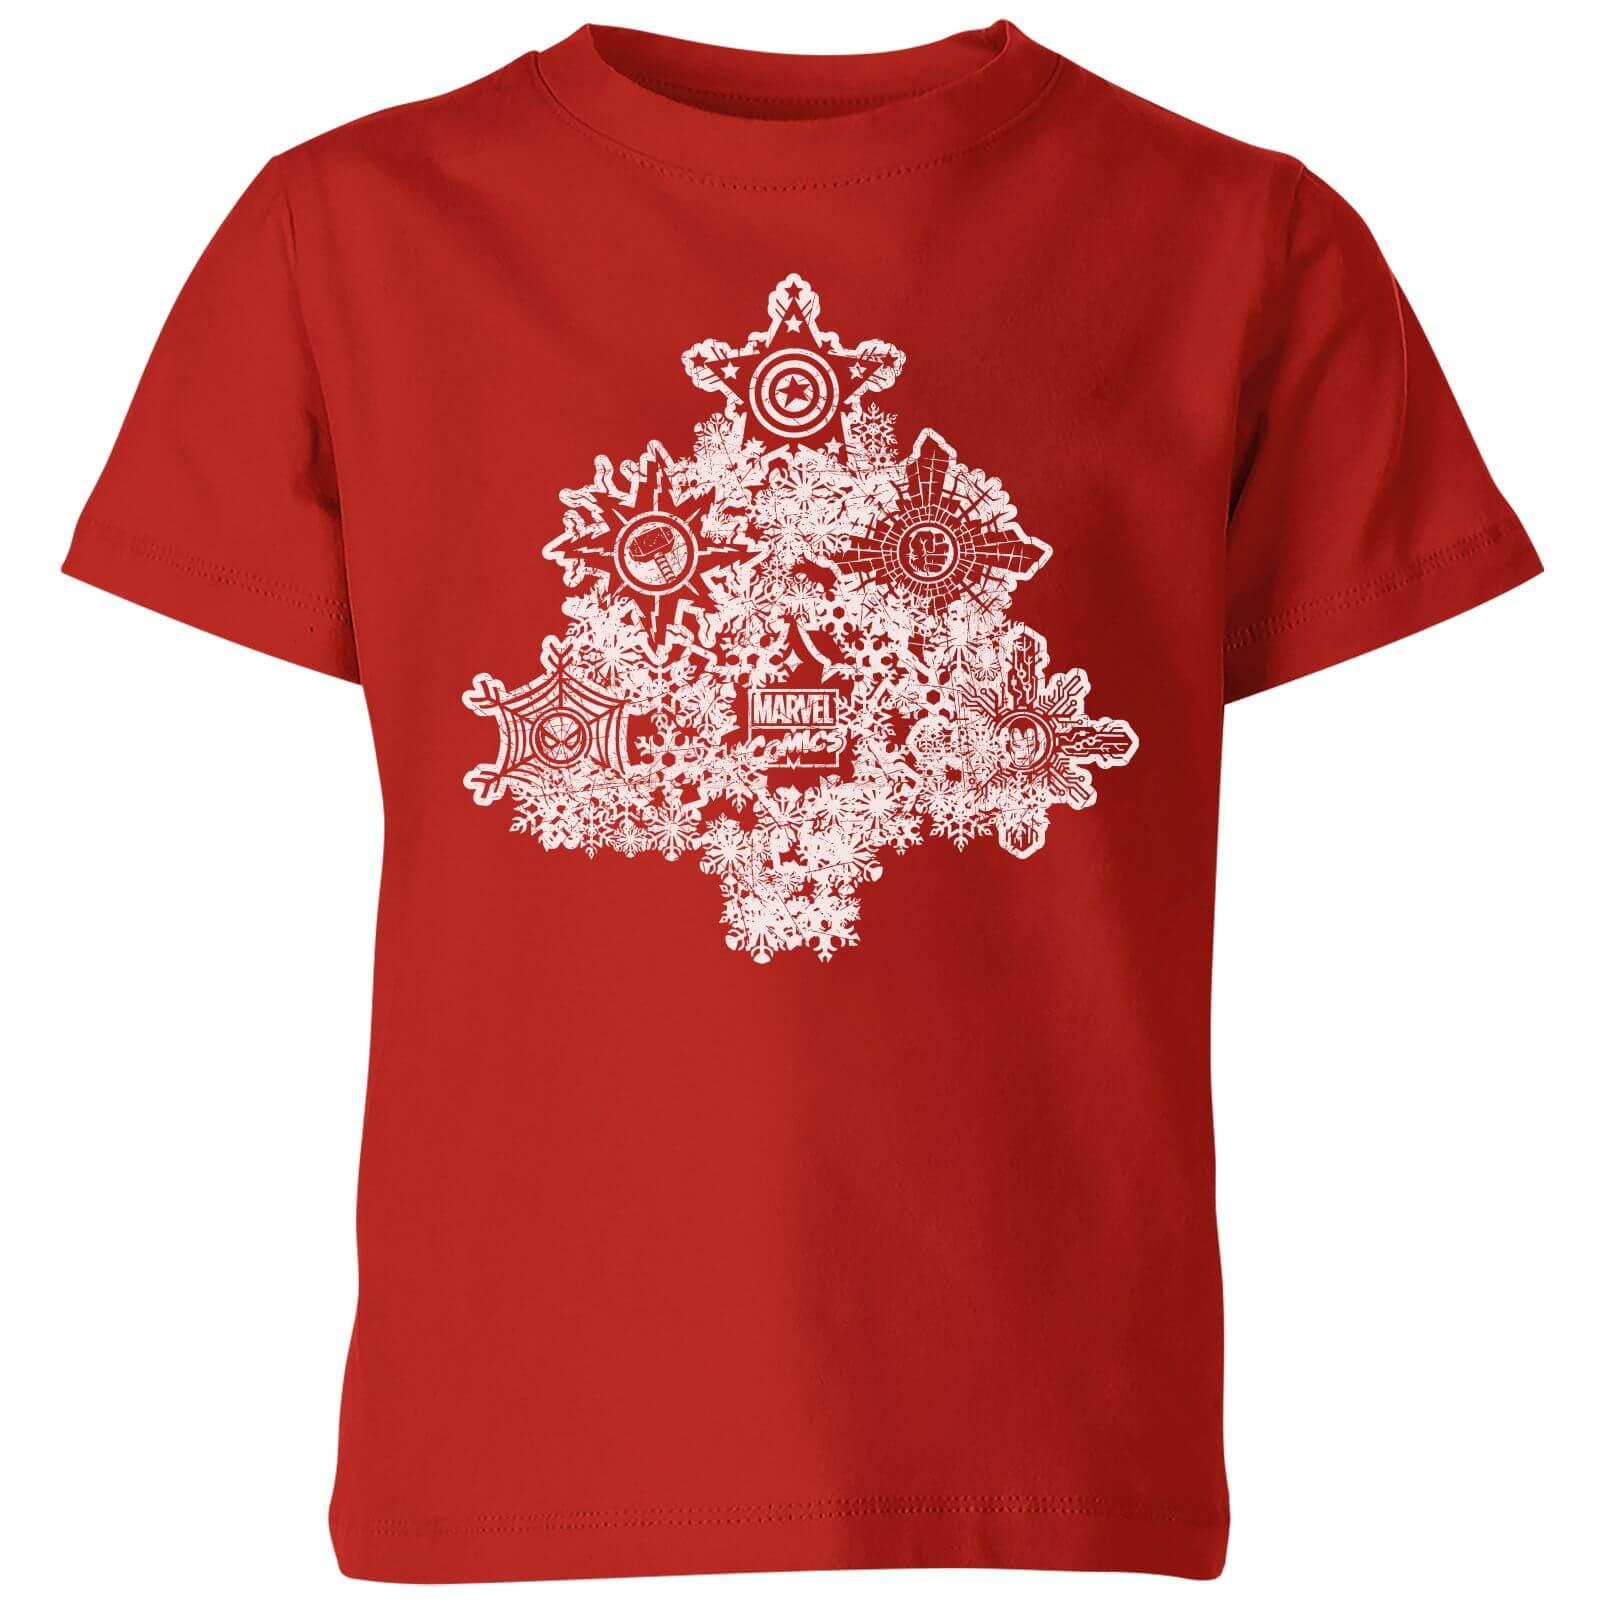 2f93c0e8d Marvel Shields Snowflakes Kids' Christmas T-Shirt - Red Clothing | Zavvi